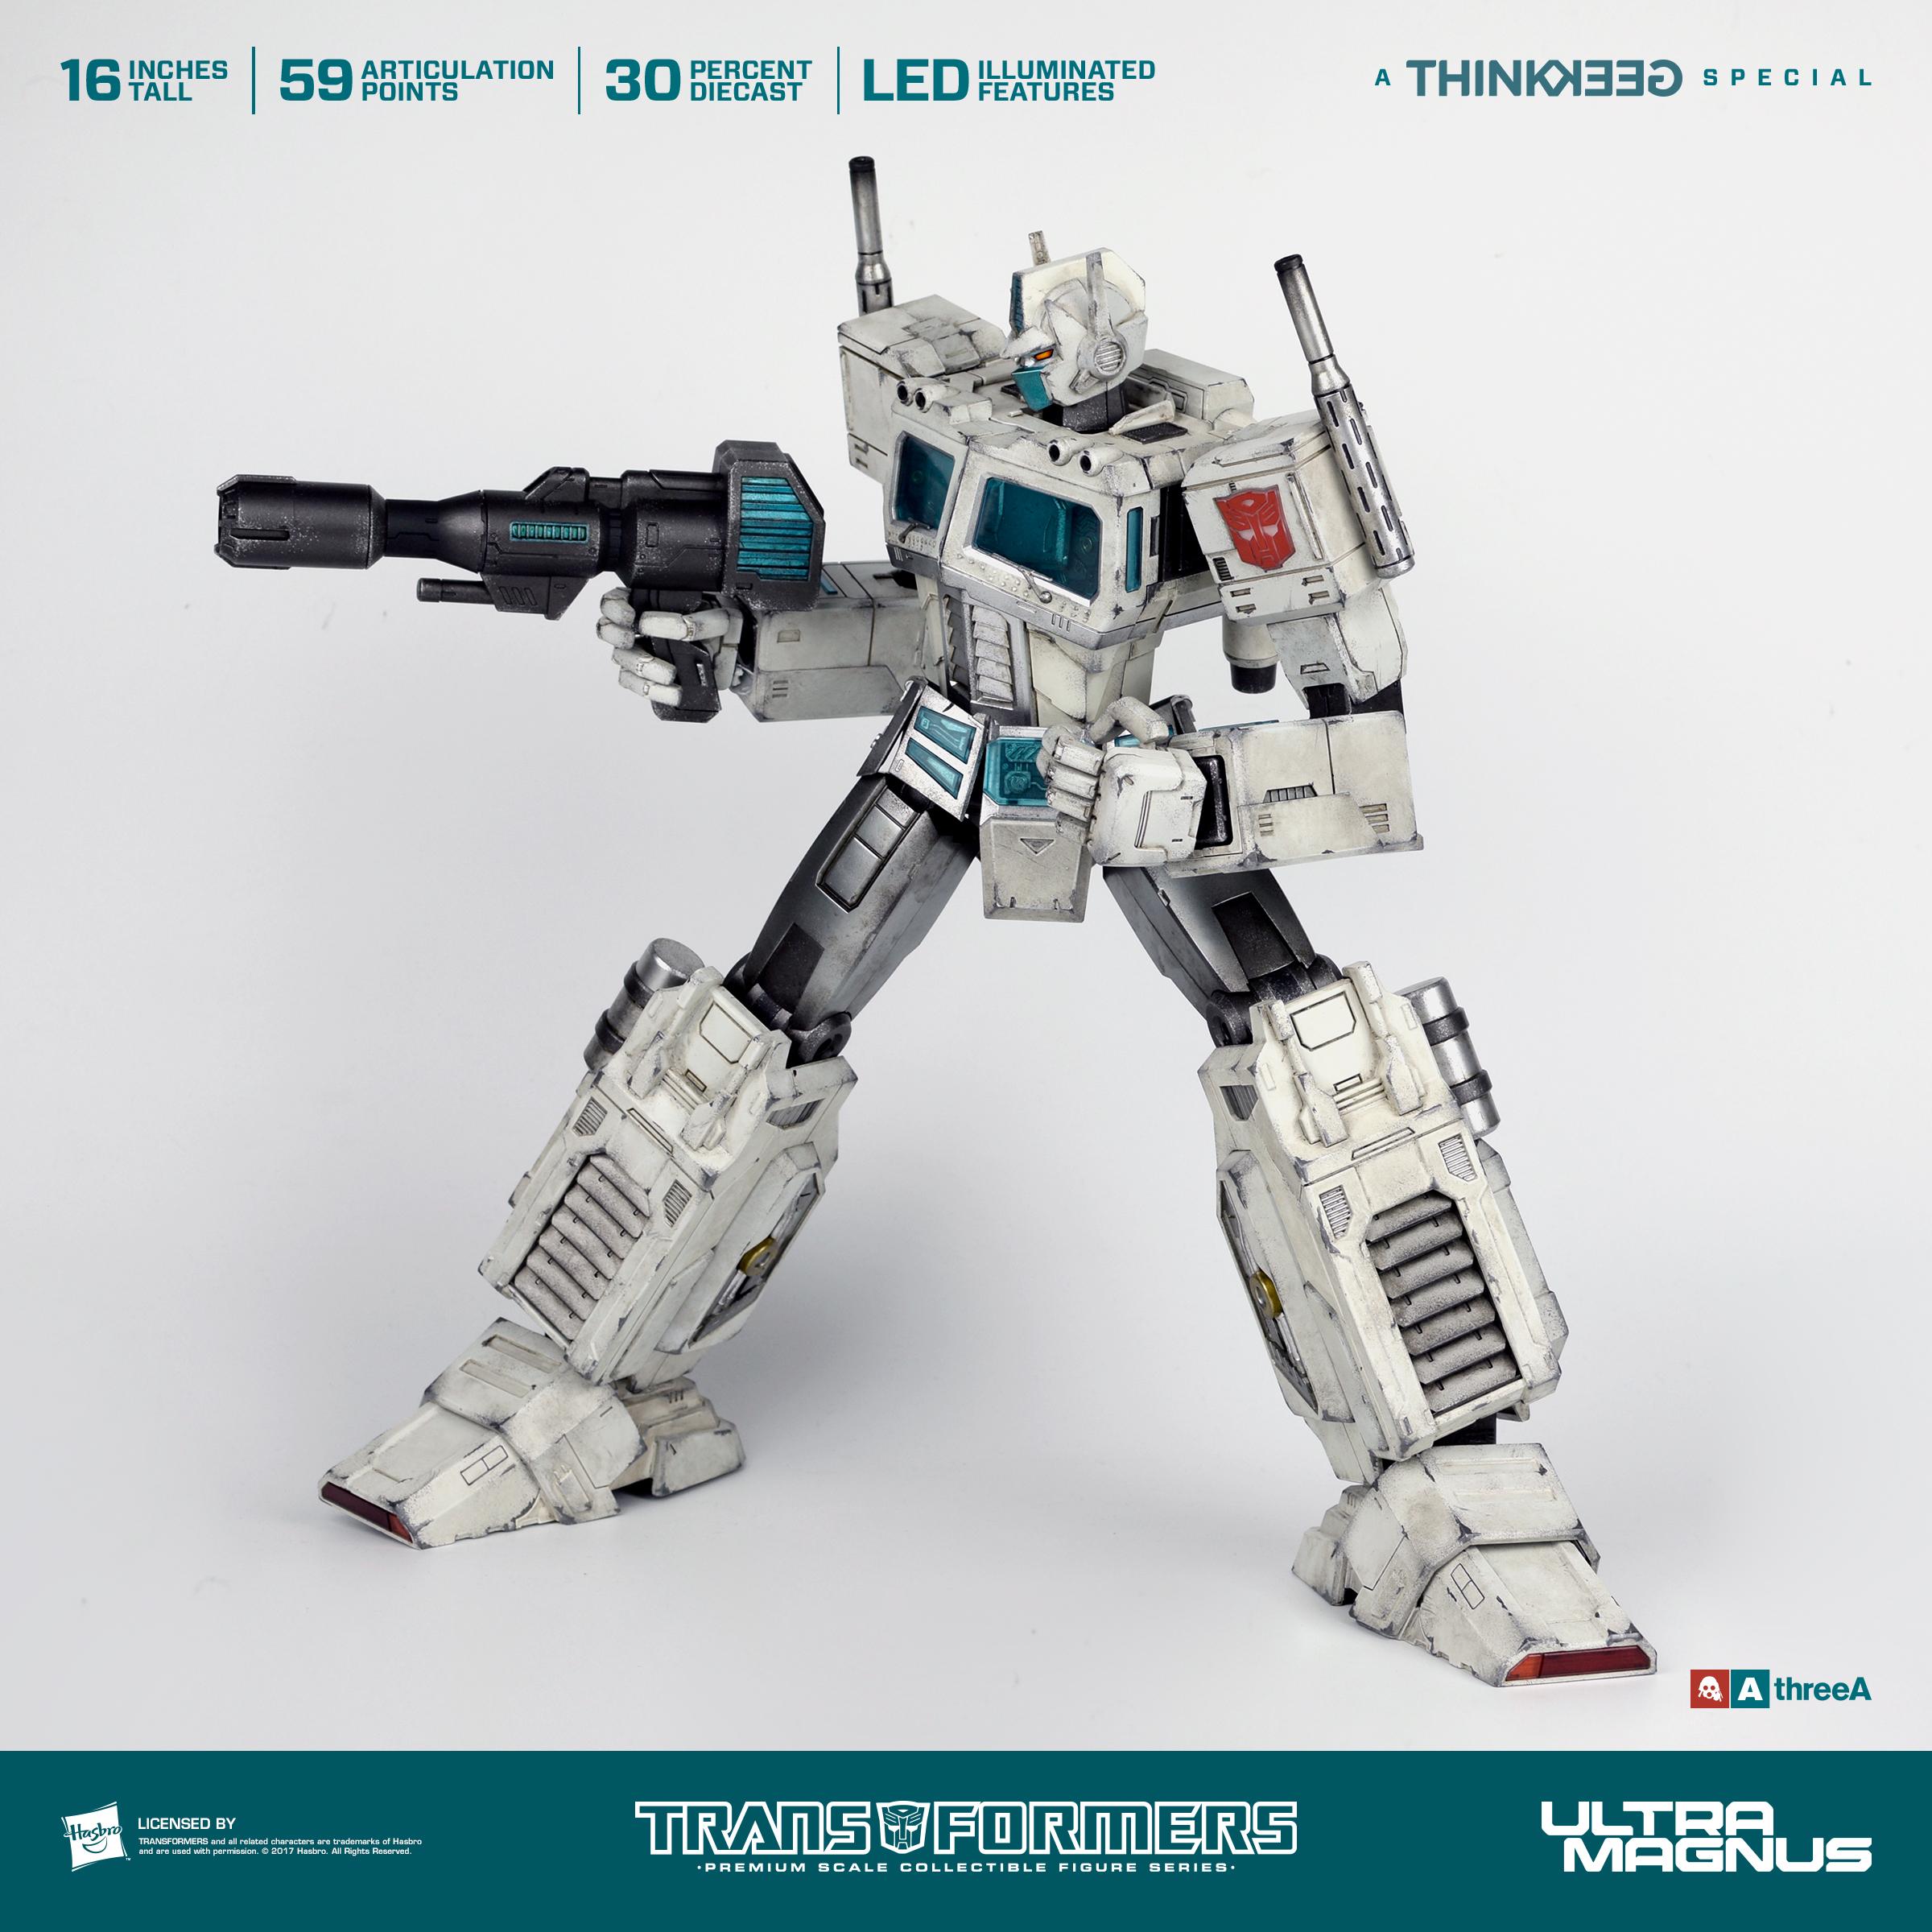 3A_Transformers_G1_UltraMagnus_RetailImages_2400x2400_004.jpg